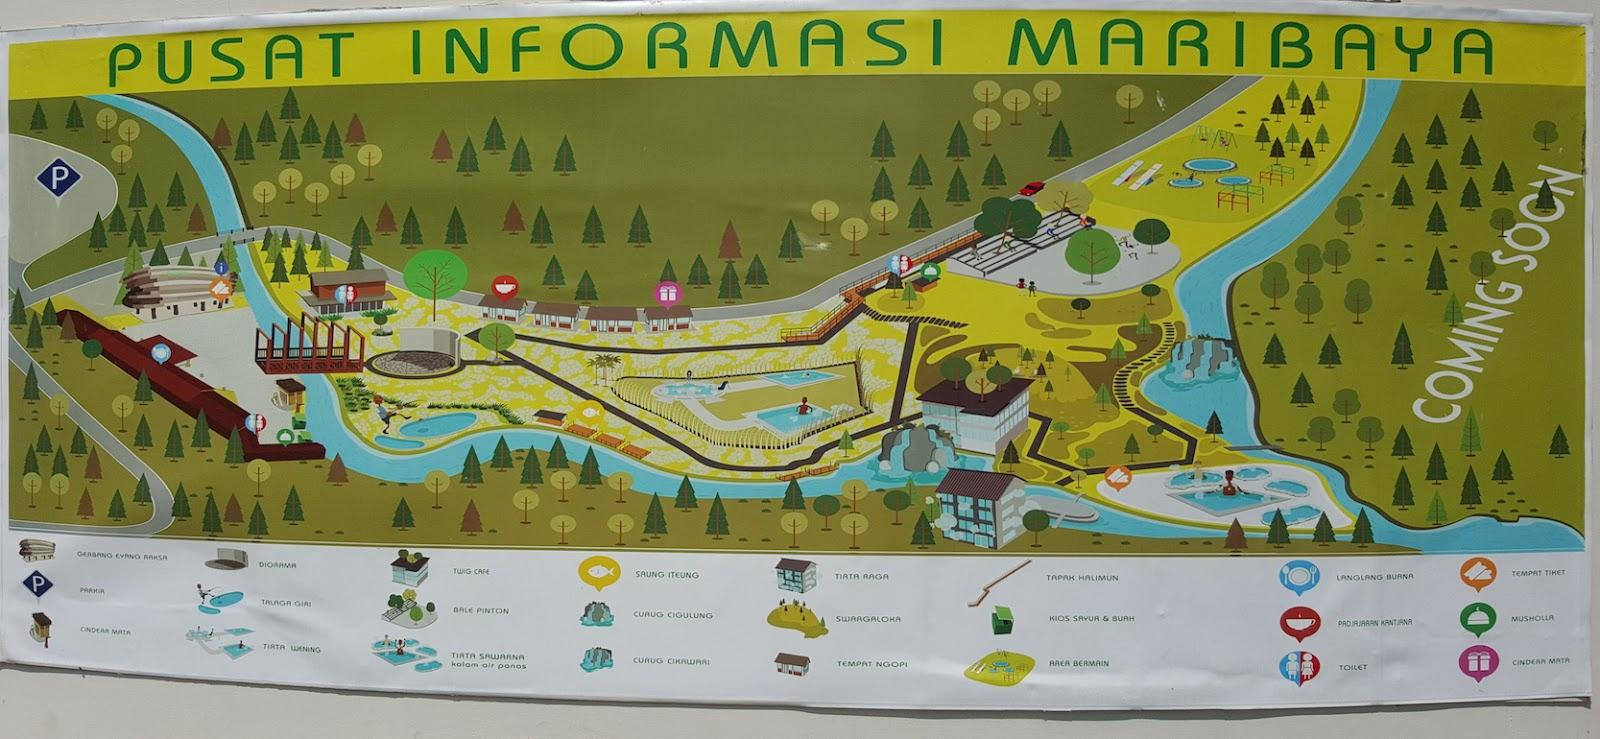 Pusat informasi Maribaya Resort